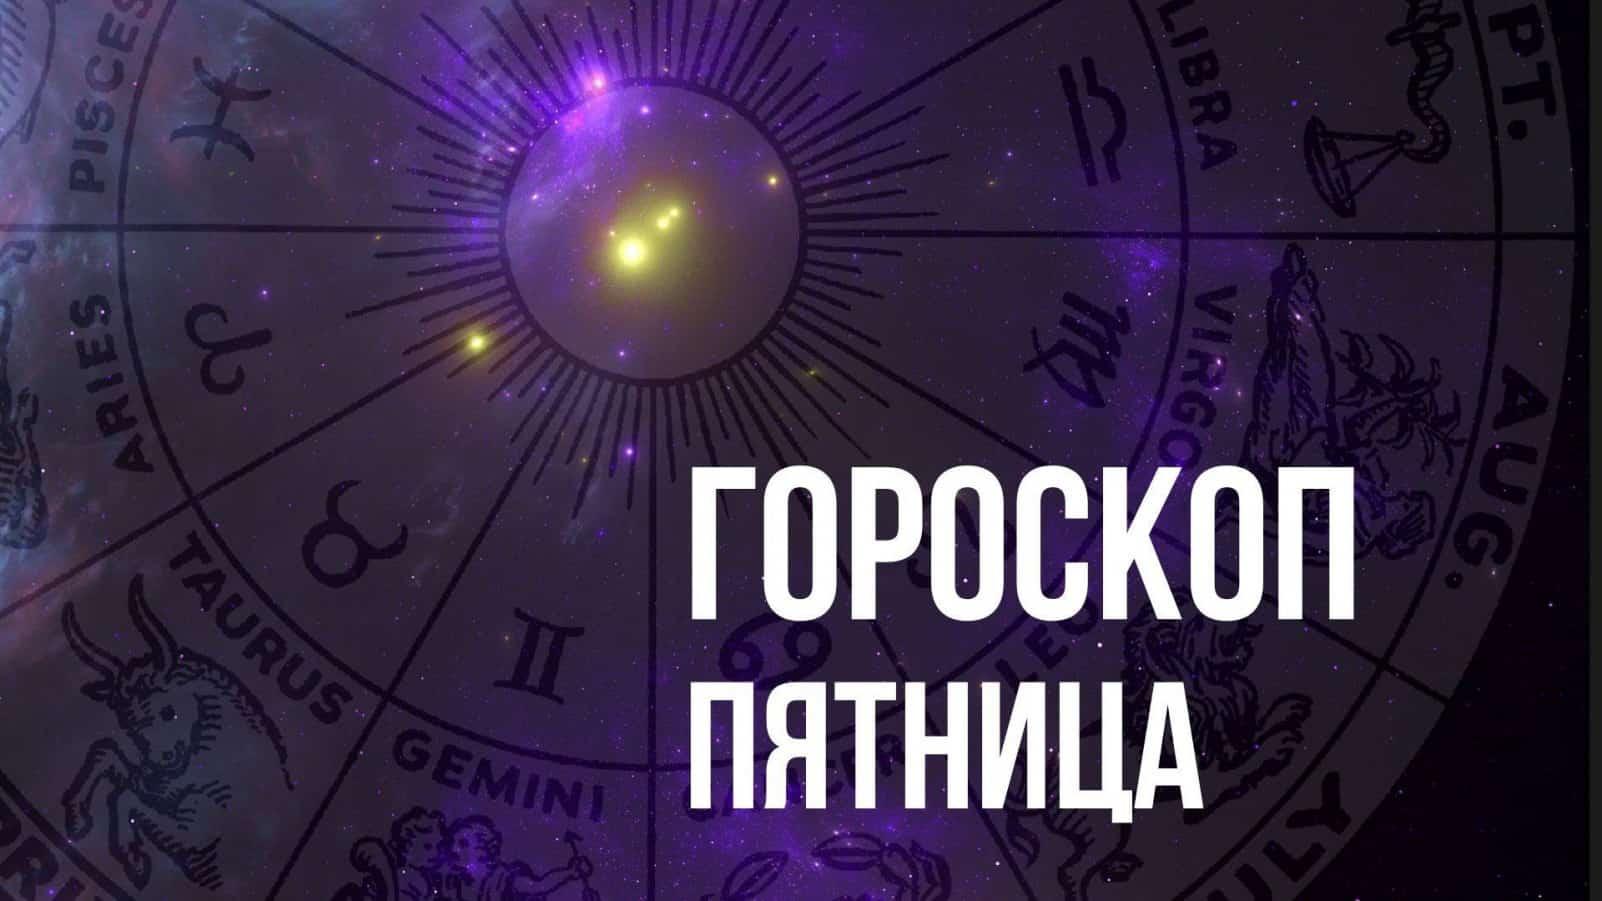 Гороскоп на пятницу 14 мая для каждого знака Зодиака